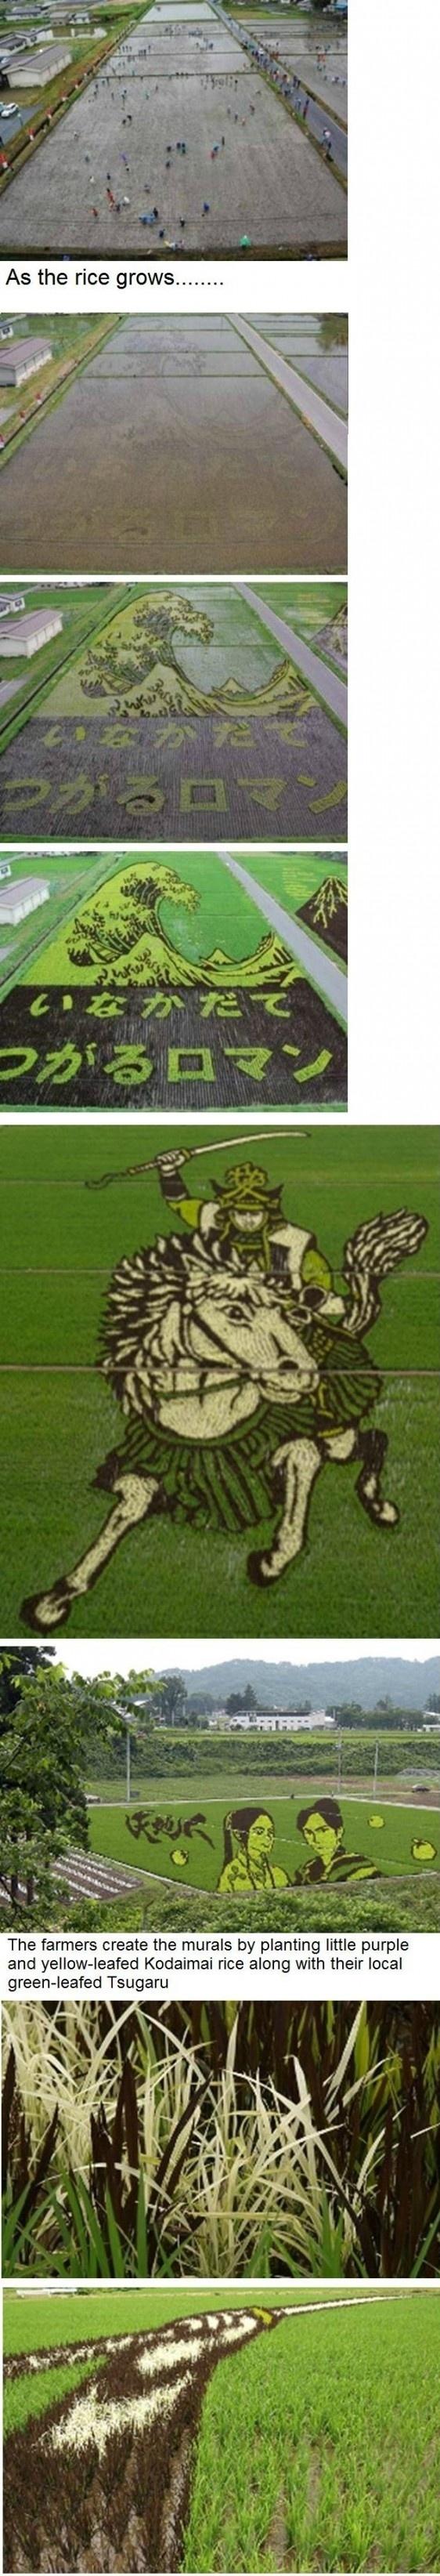 Mind-blowing Rice Fields In Japan